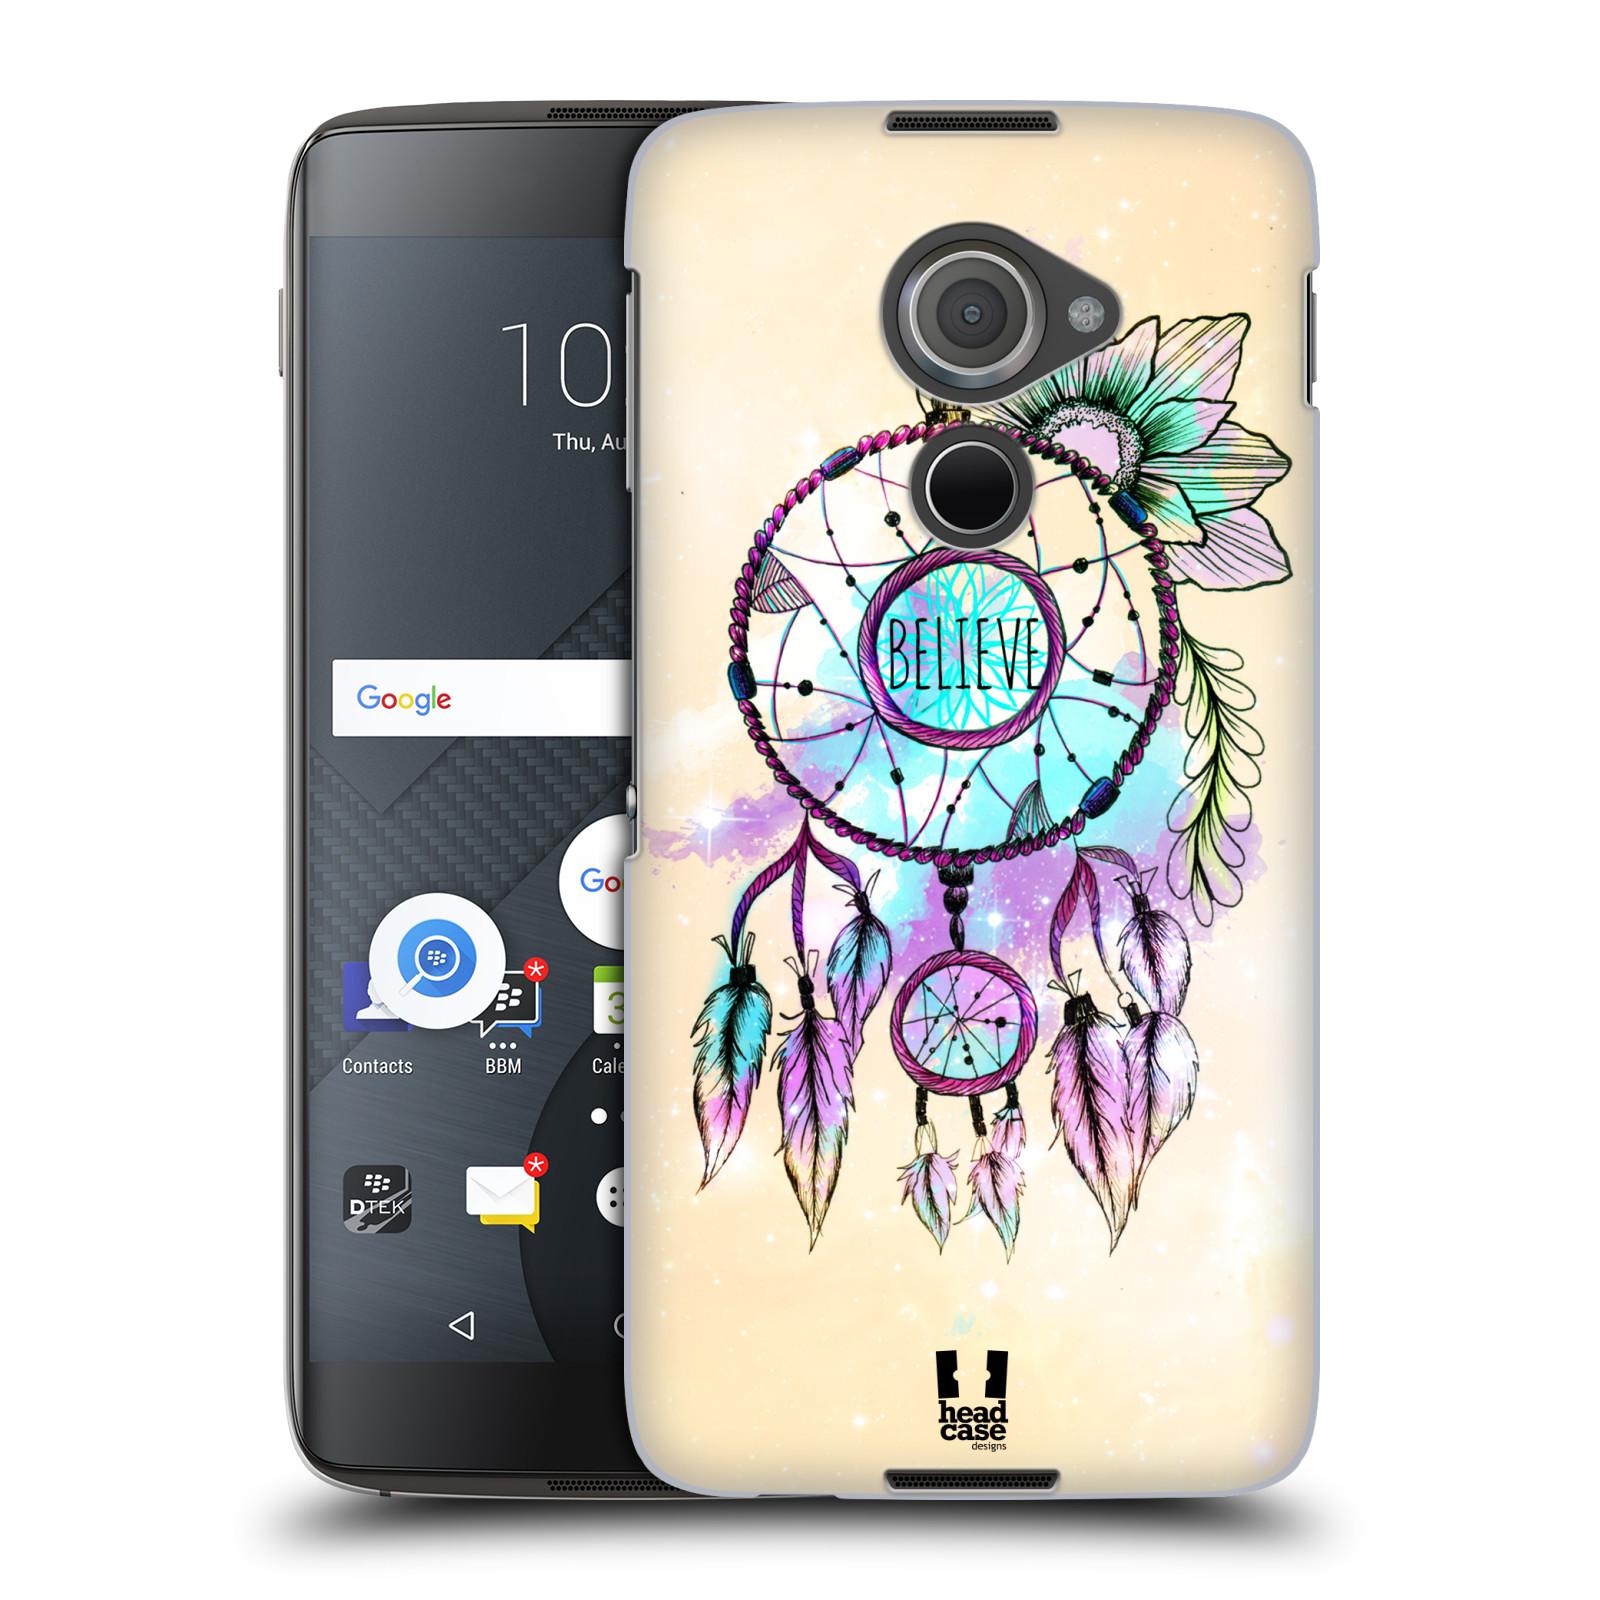 Plastové pouzdro na mobil Blackberry DTEK60 (Argon) - Head Case MIX BELIEVE